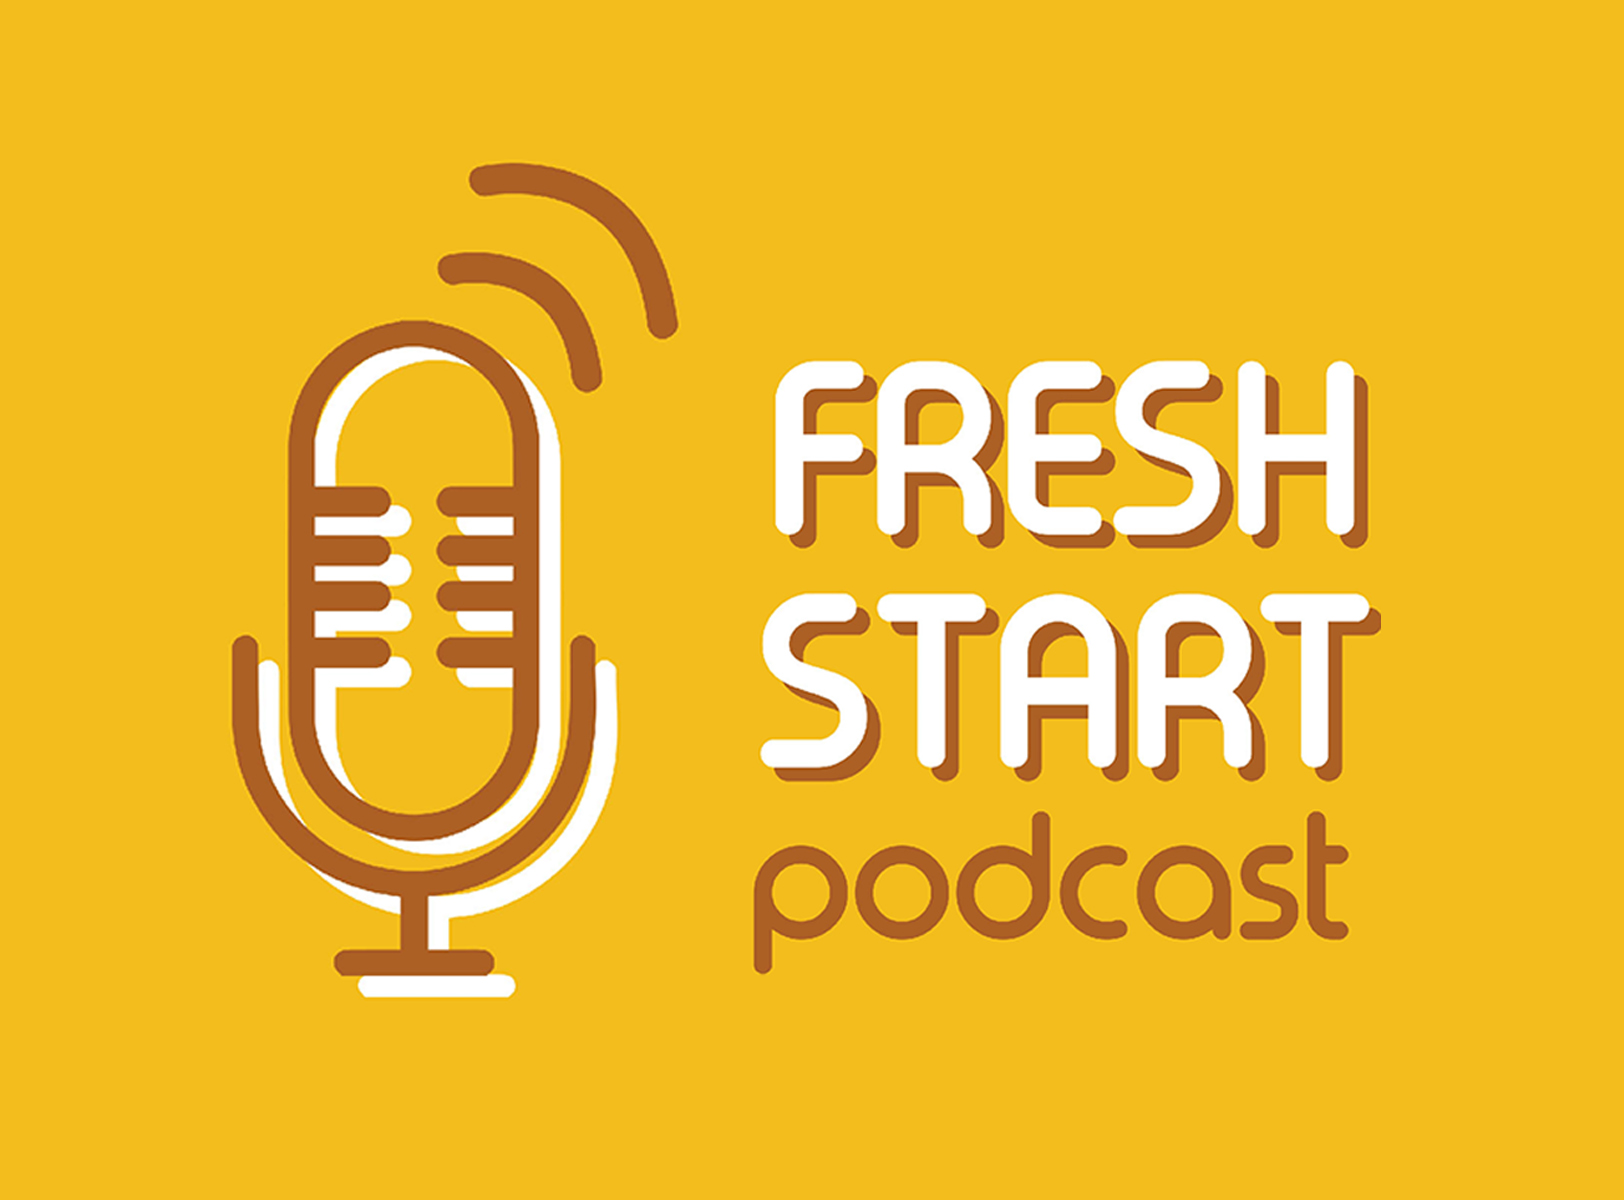 Fresh Start: Podcast News (1/25/2019 Fri.)